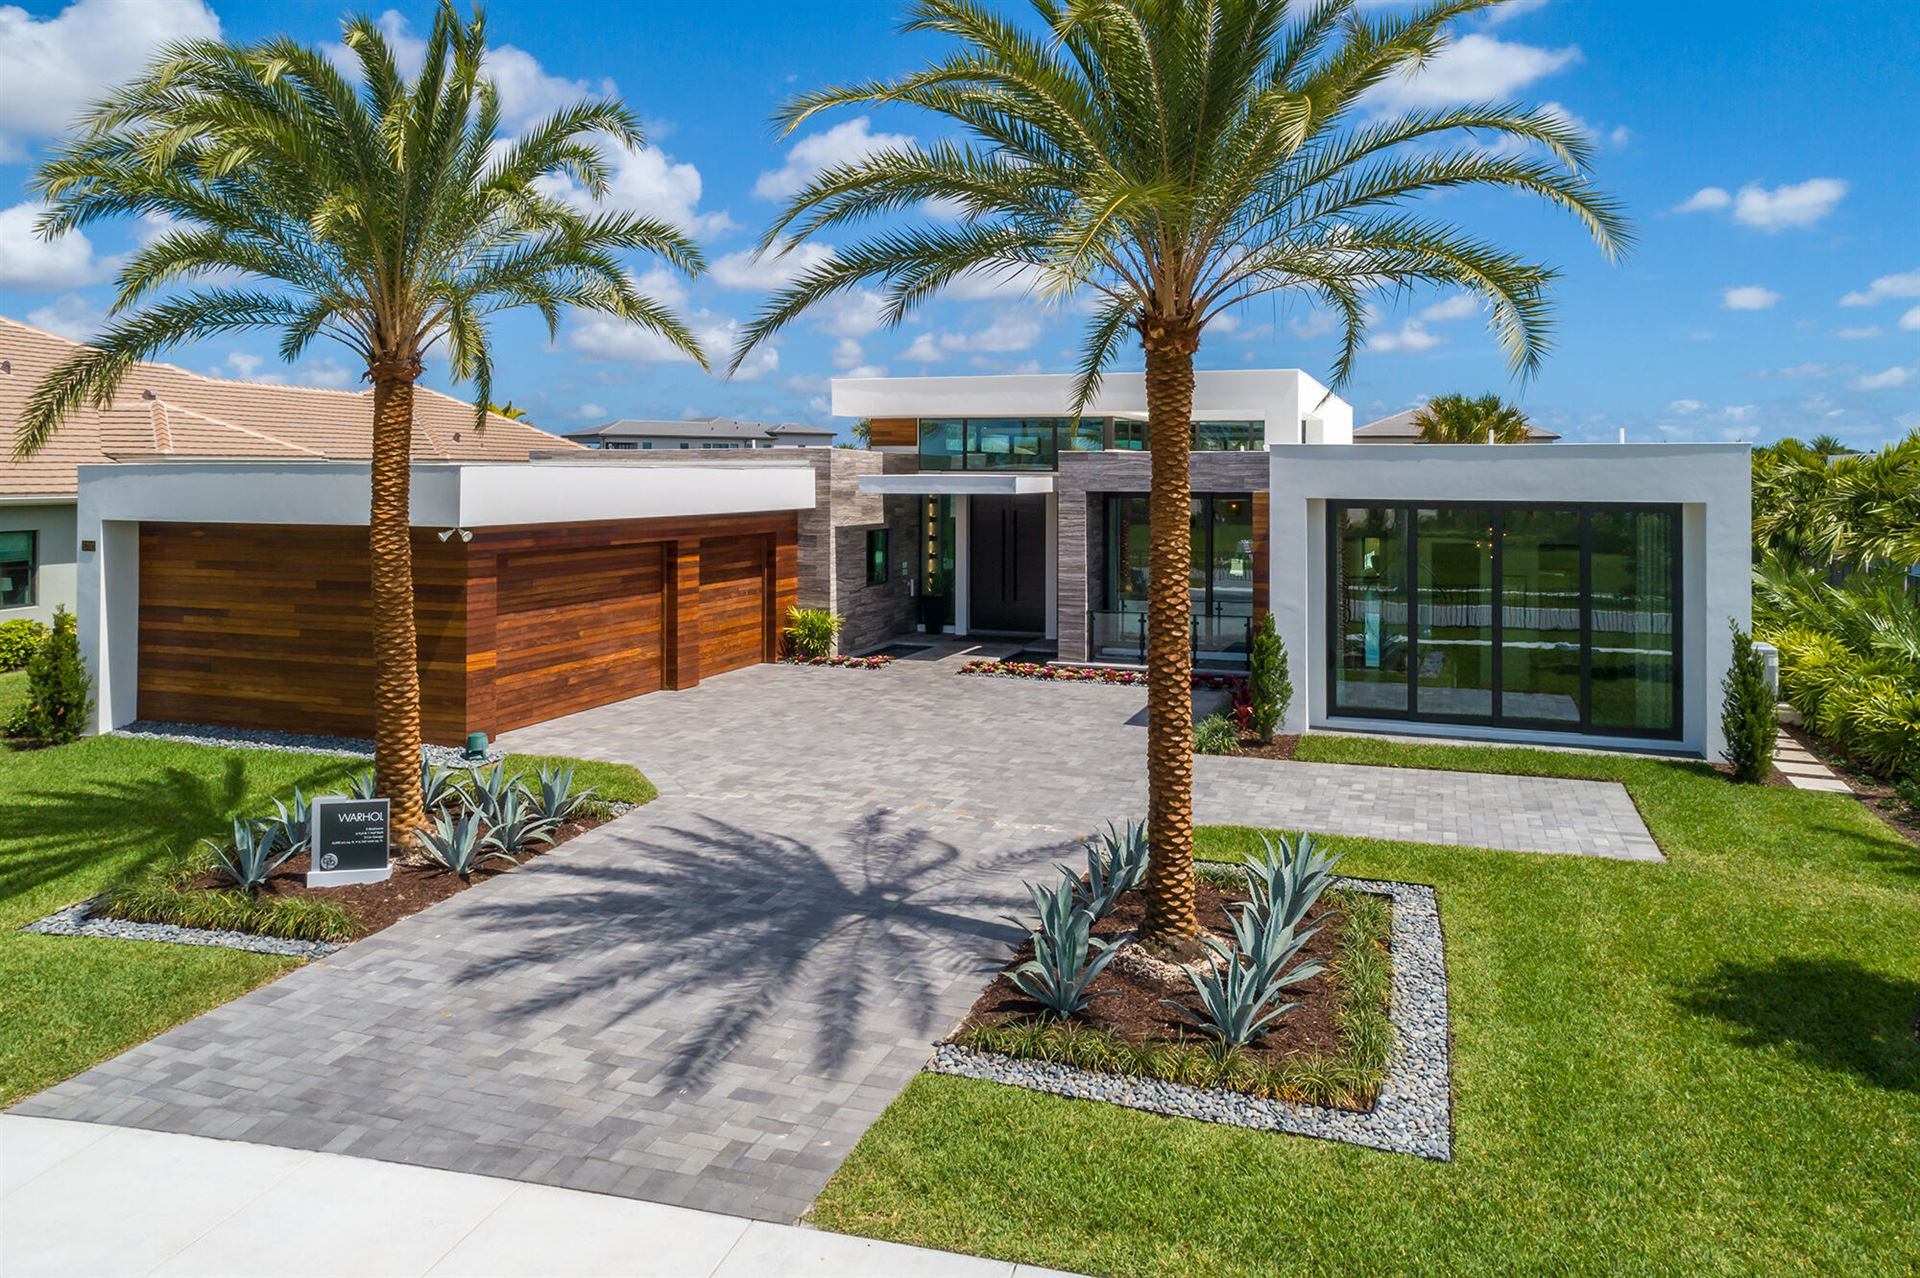 17242 Brulee Breeze Way, Boca Raton, FL 33496 - MLS#: RX-10744272